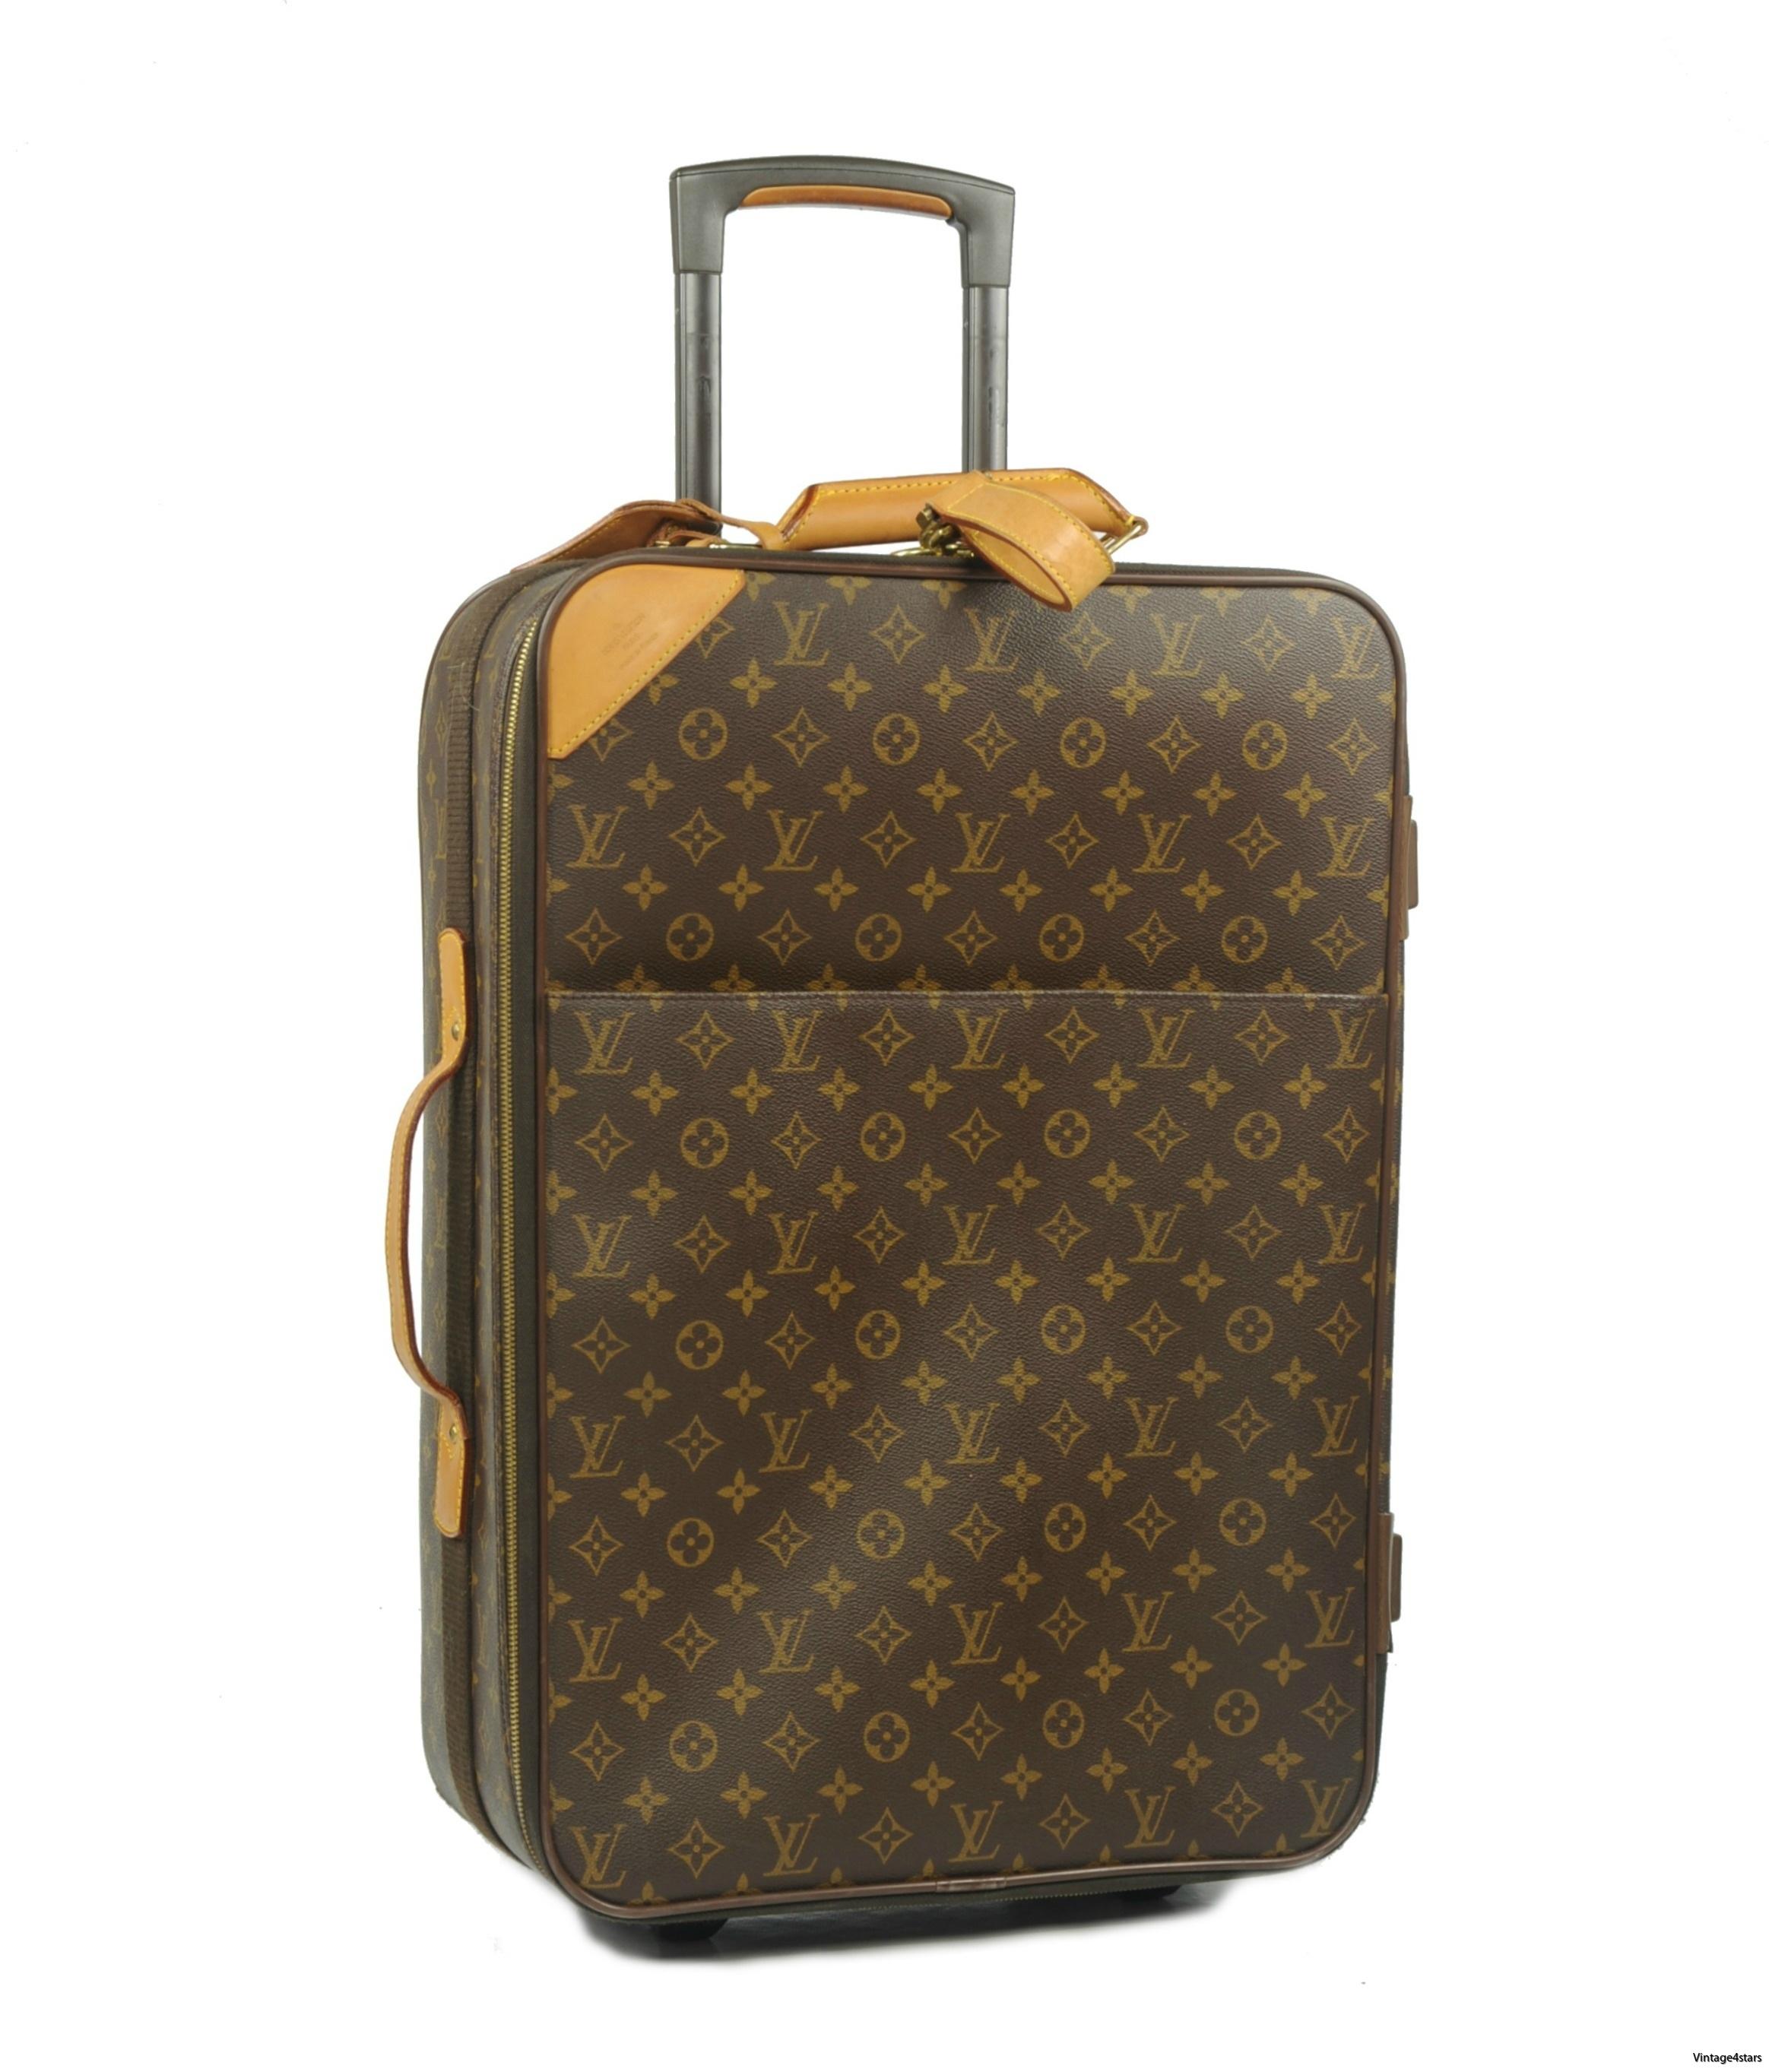 Louis Vuitton Pegase 55 Monogram 12